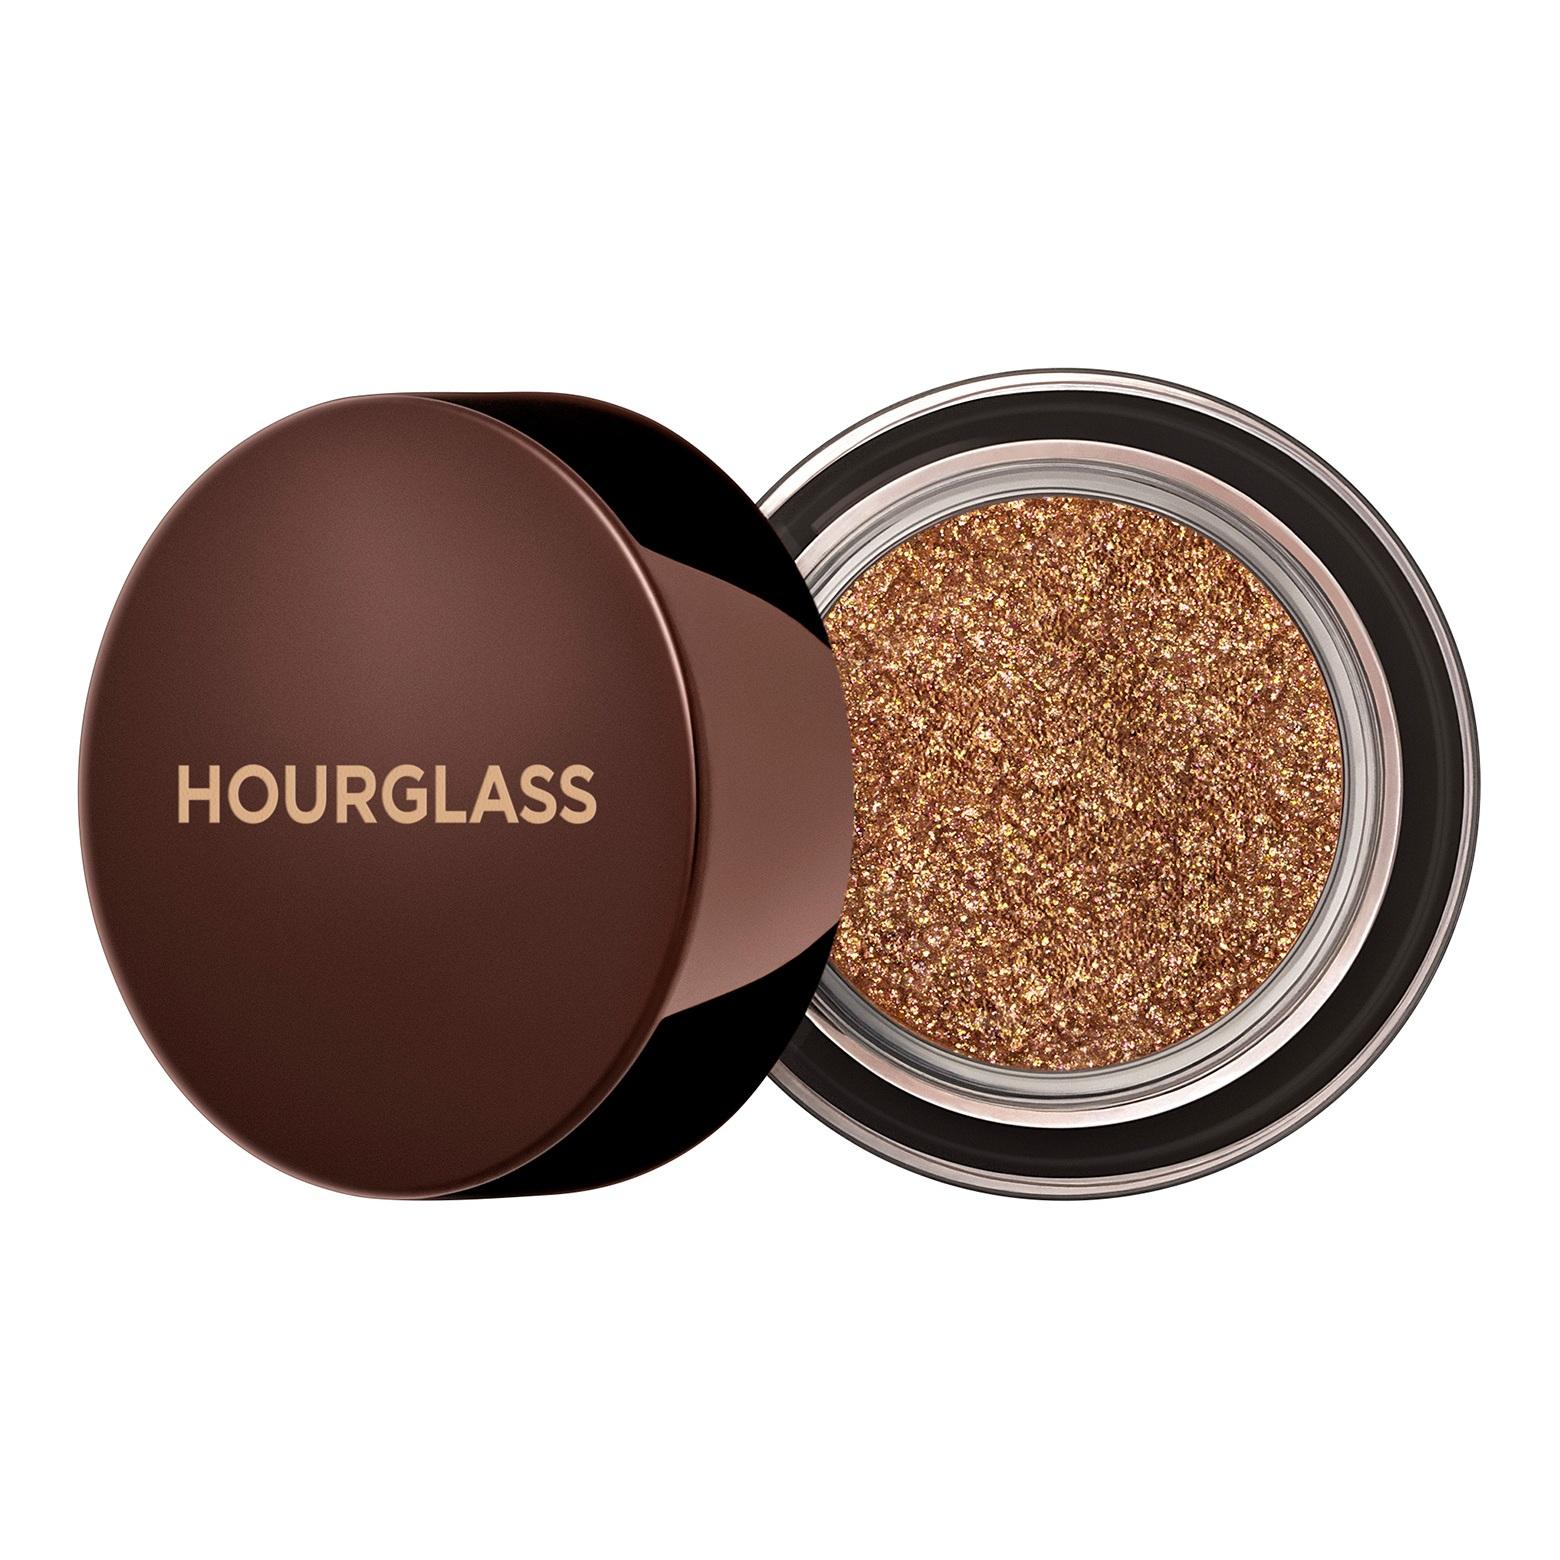 houxxx_hourglasscosmetics_scatteredlightglittereyeshadow_foil_2_1560x1960-vbzi9.jpg